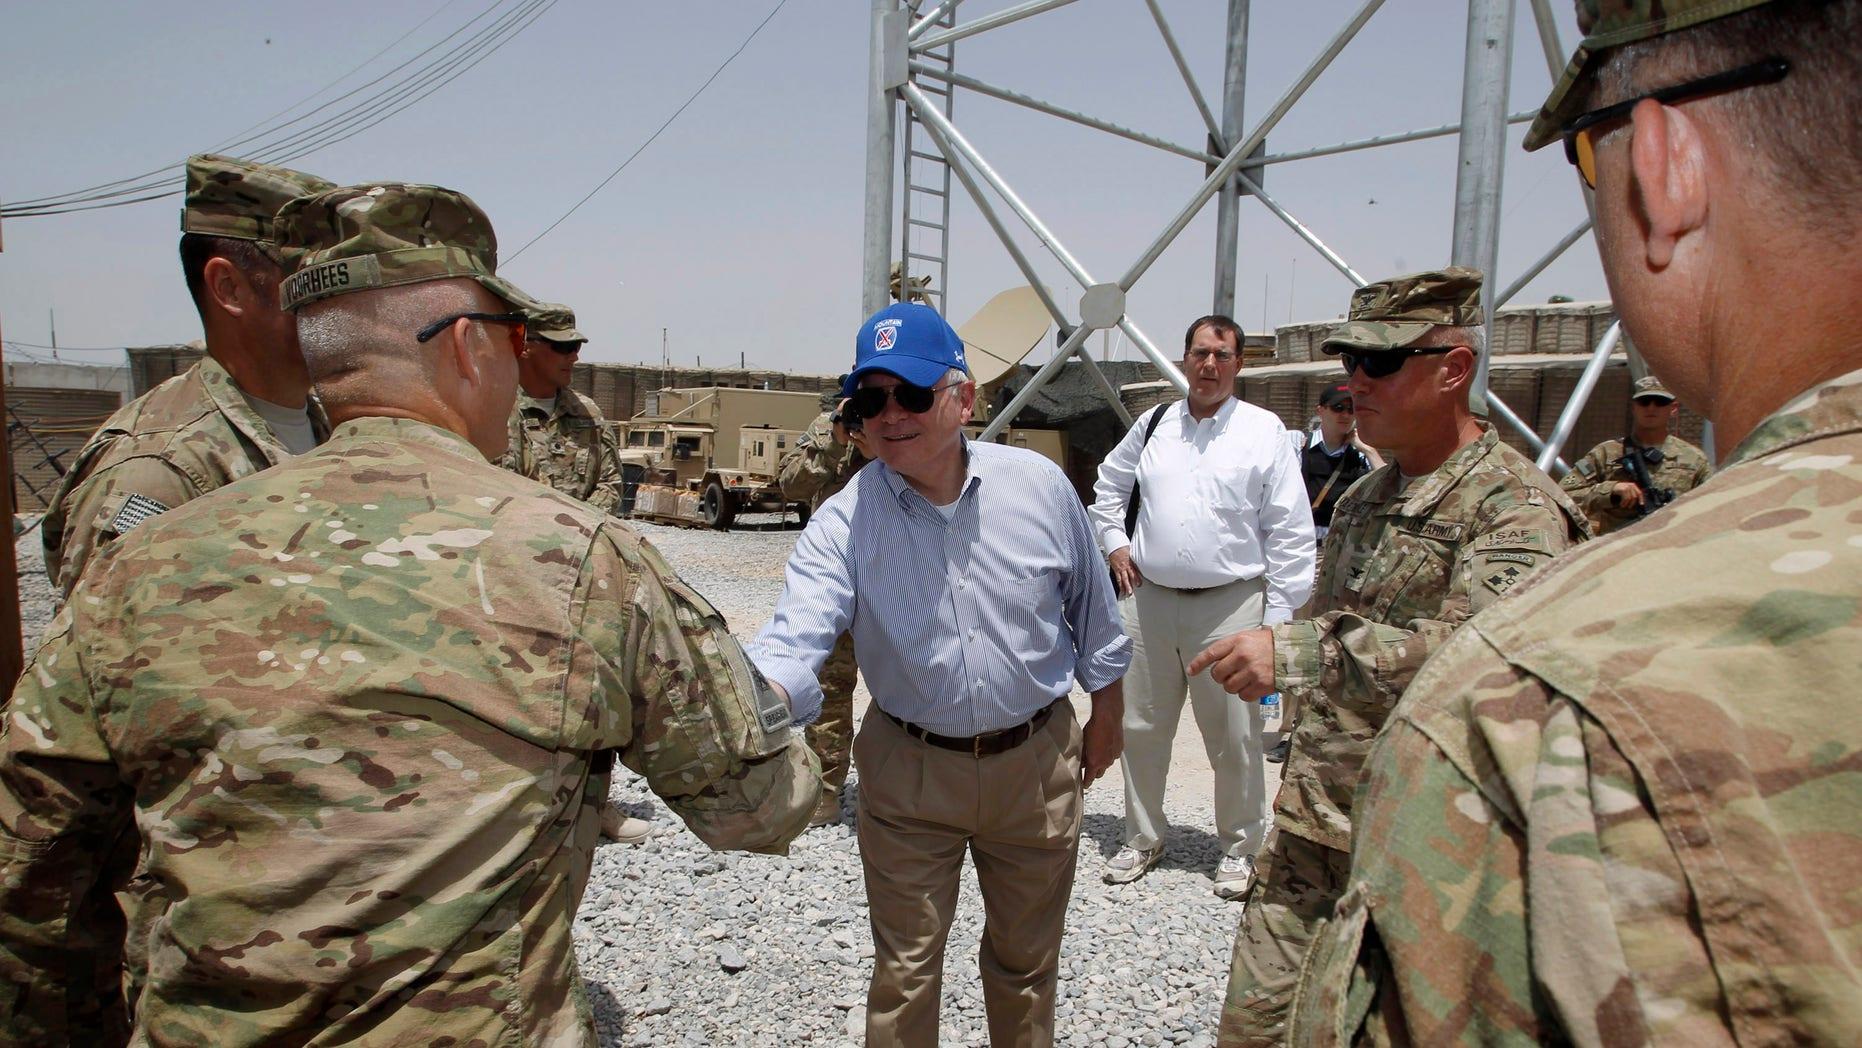 Sunday: Defense Secretary Robert Gates thanks troops at Forward Operating Base (FOB) Walton in Kandahar, Afghanistan.